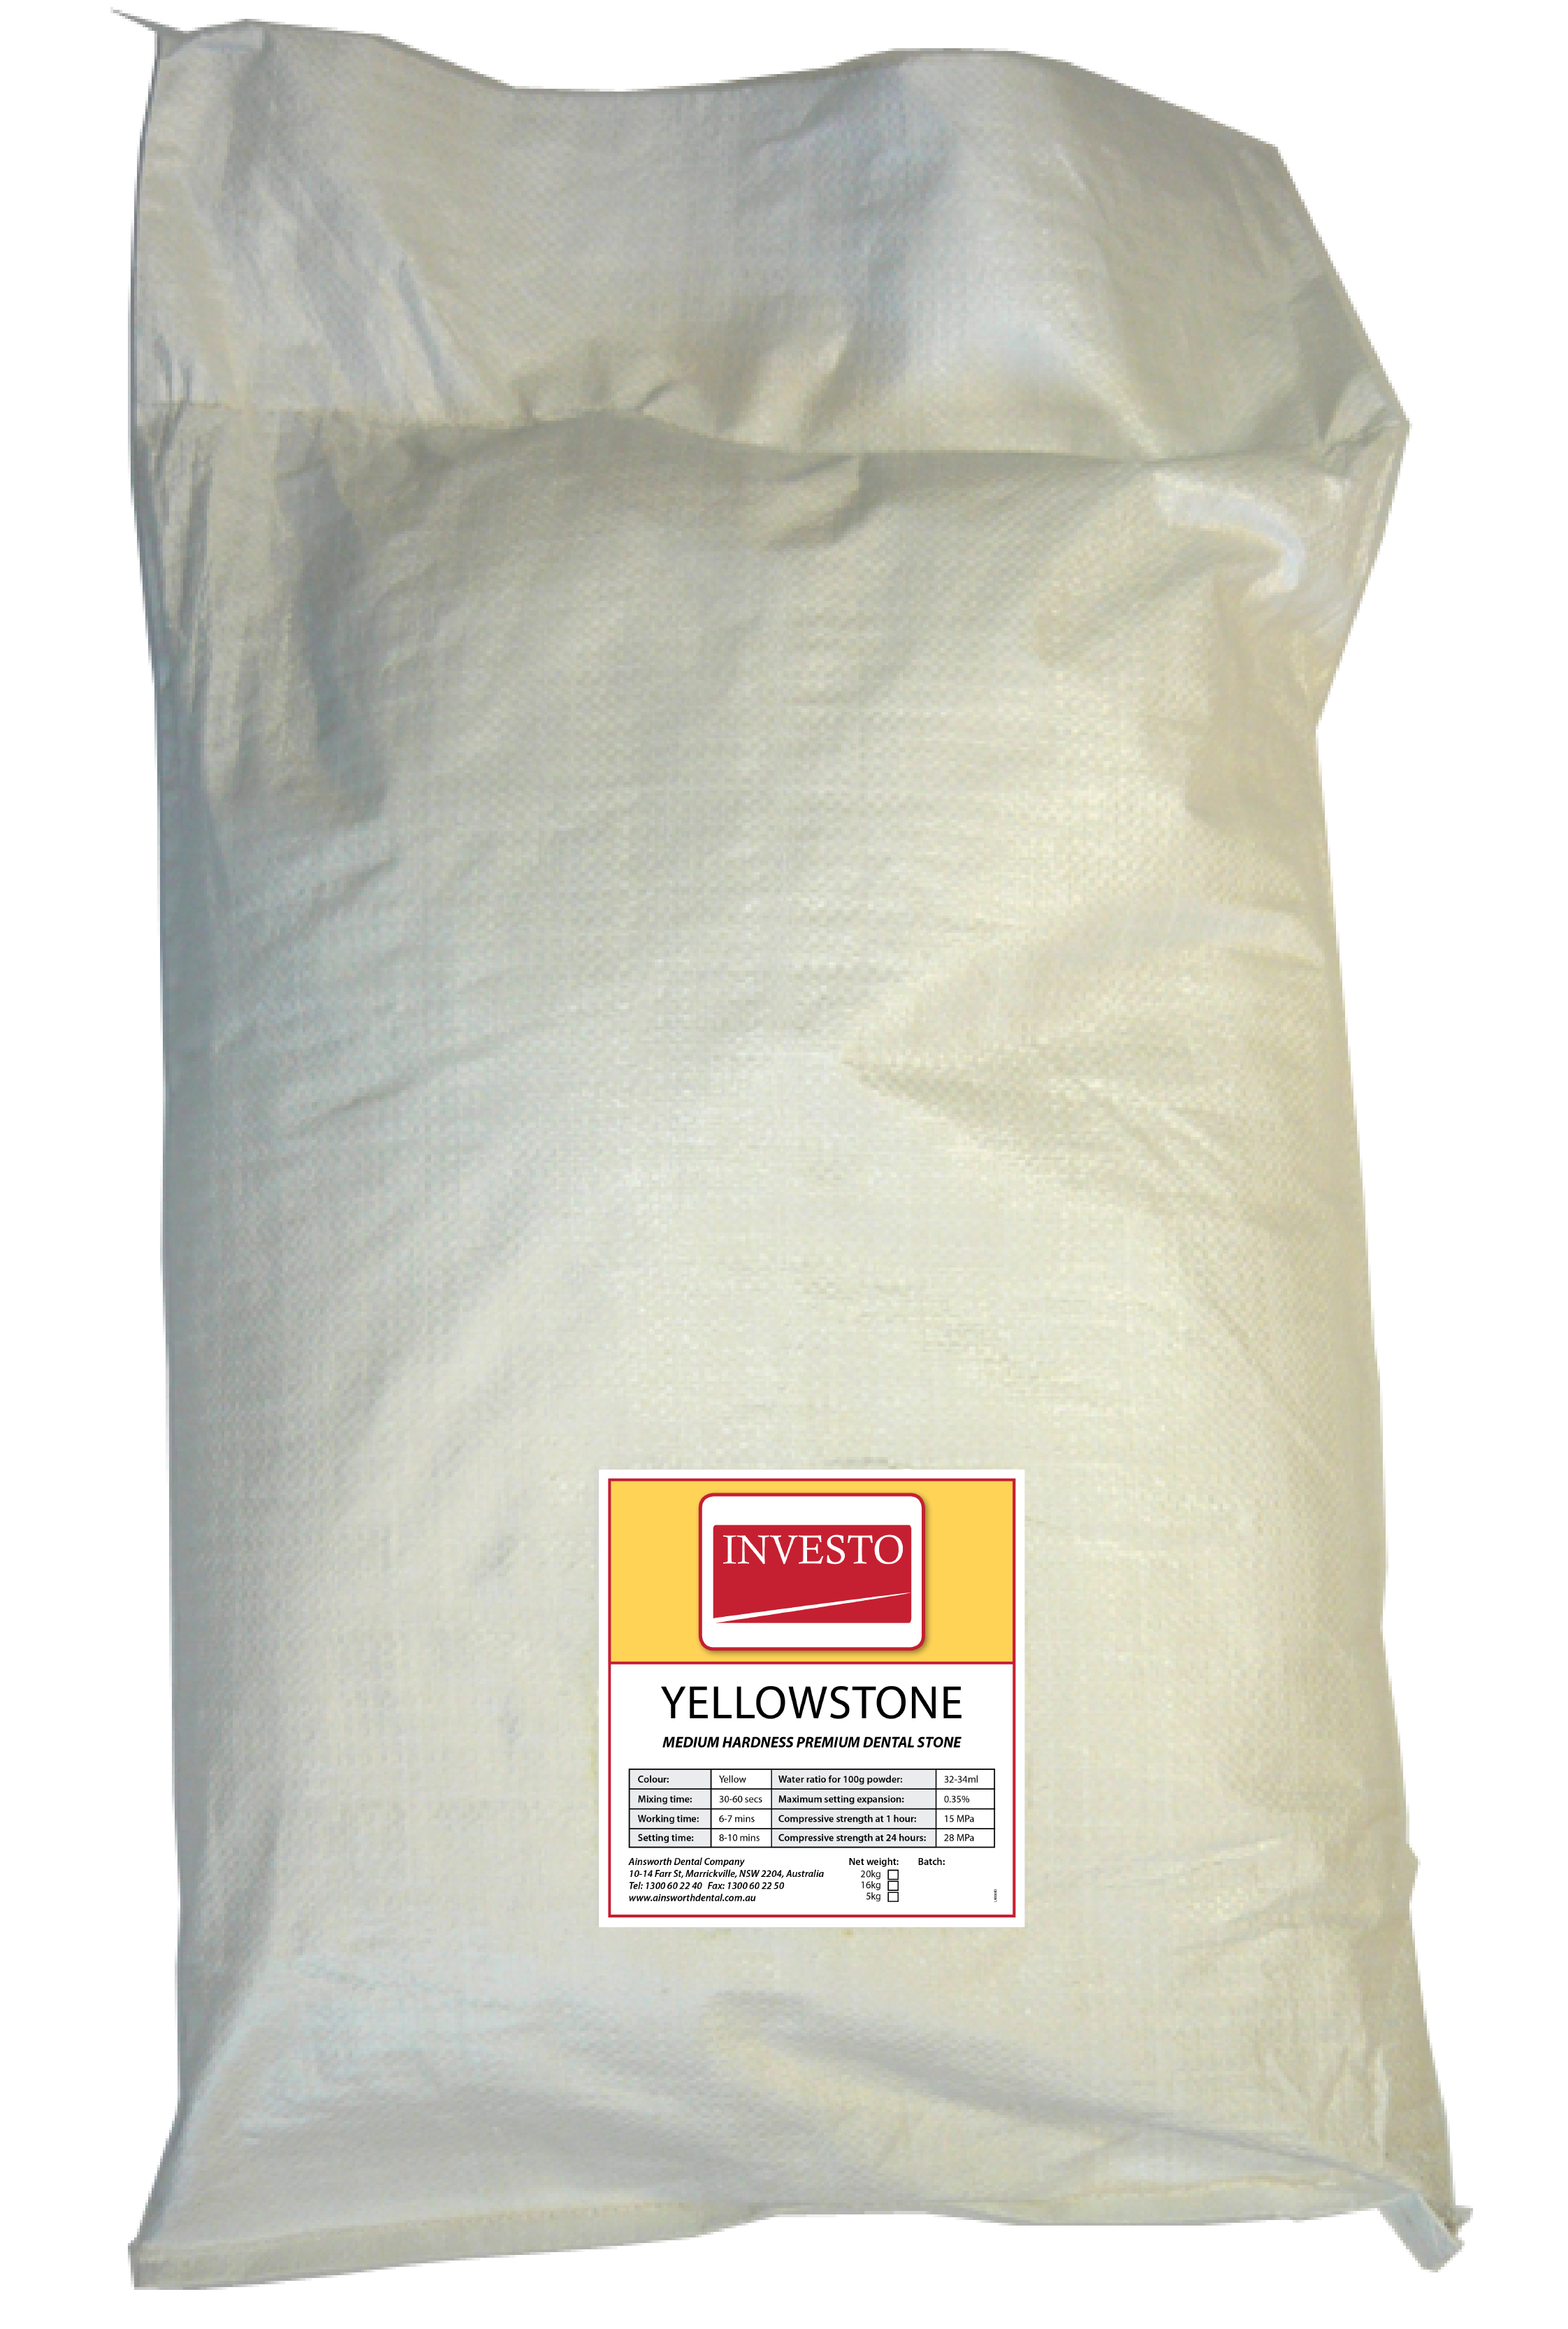 Investo Yellowstone 20kg Bag